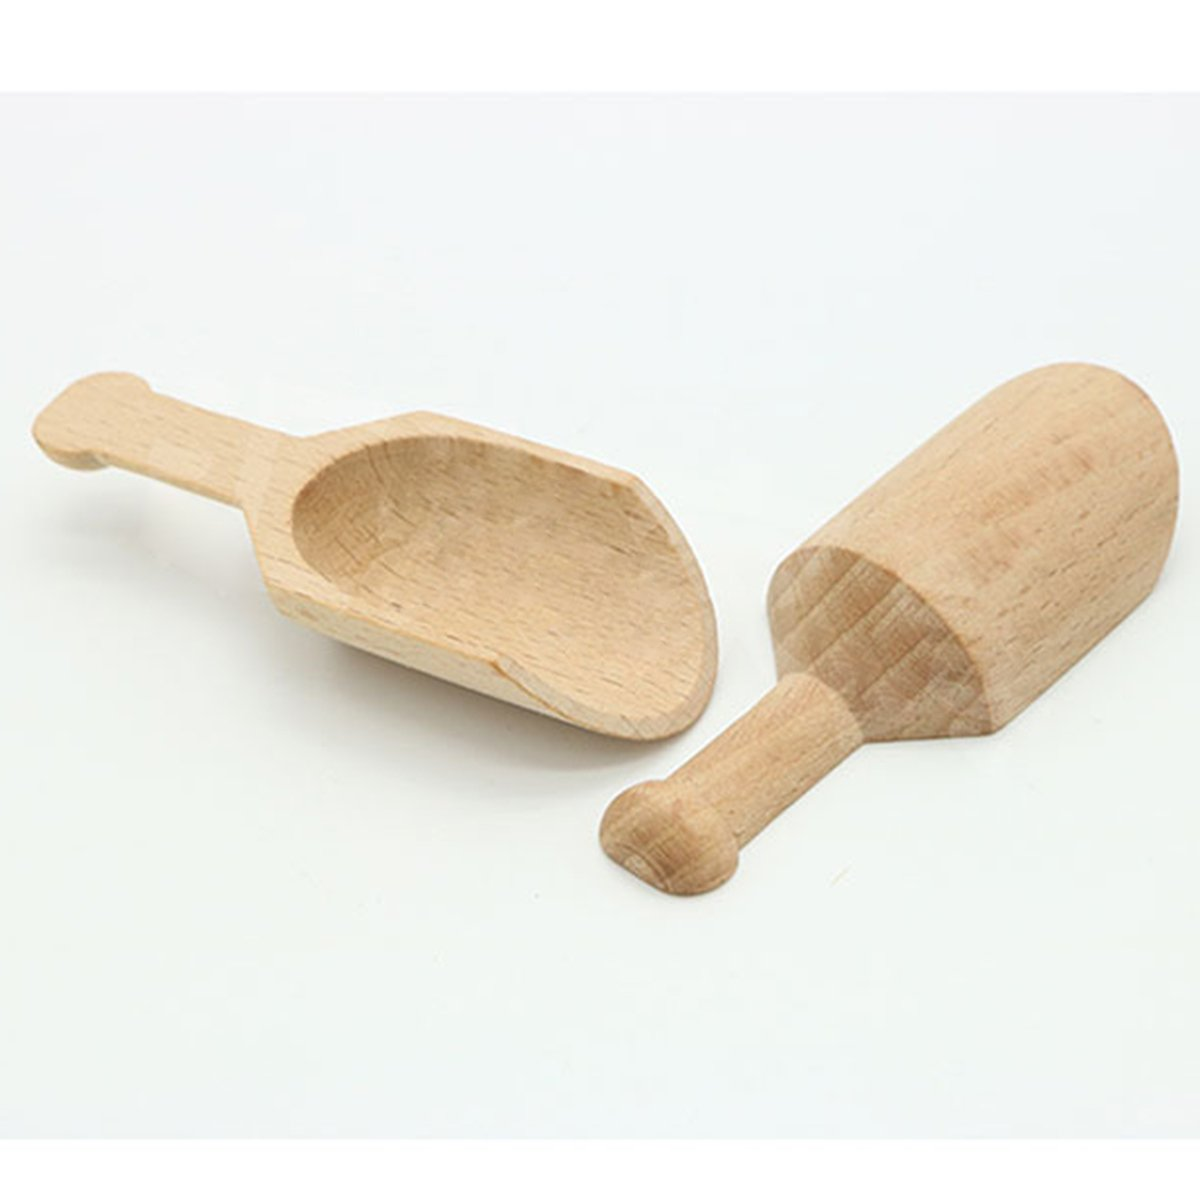 Justdolife Kitchen Wood Scoop Handcrafted Wood Candy Spoon Wood Tea Scoop Mini Wood Scoop Wood Scoop